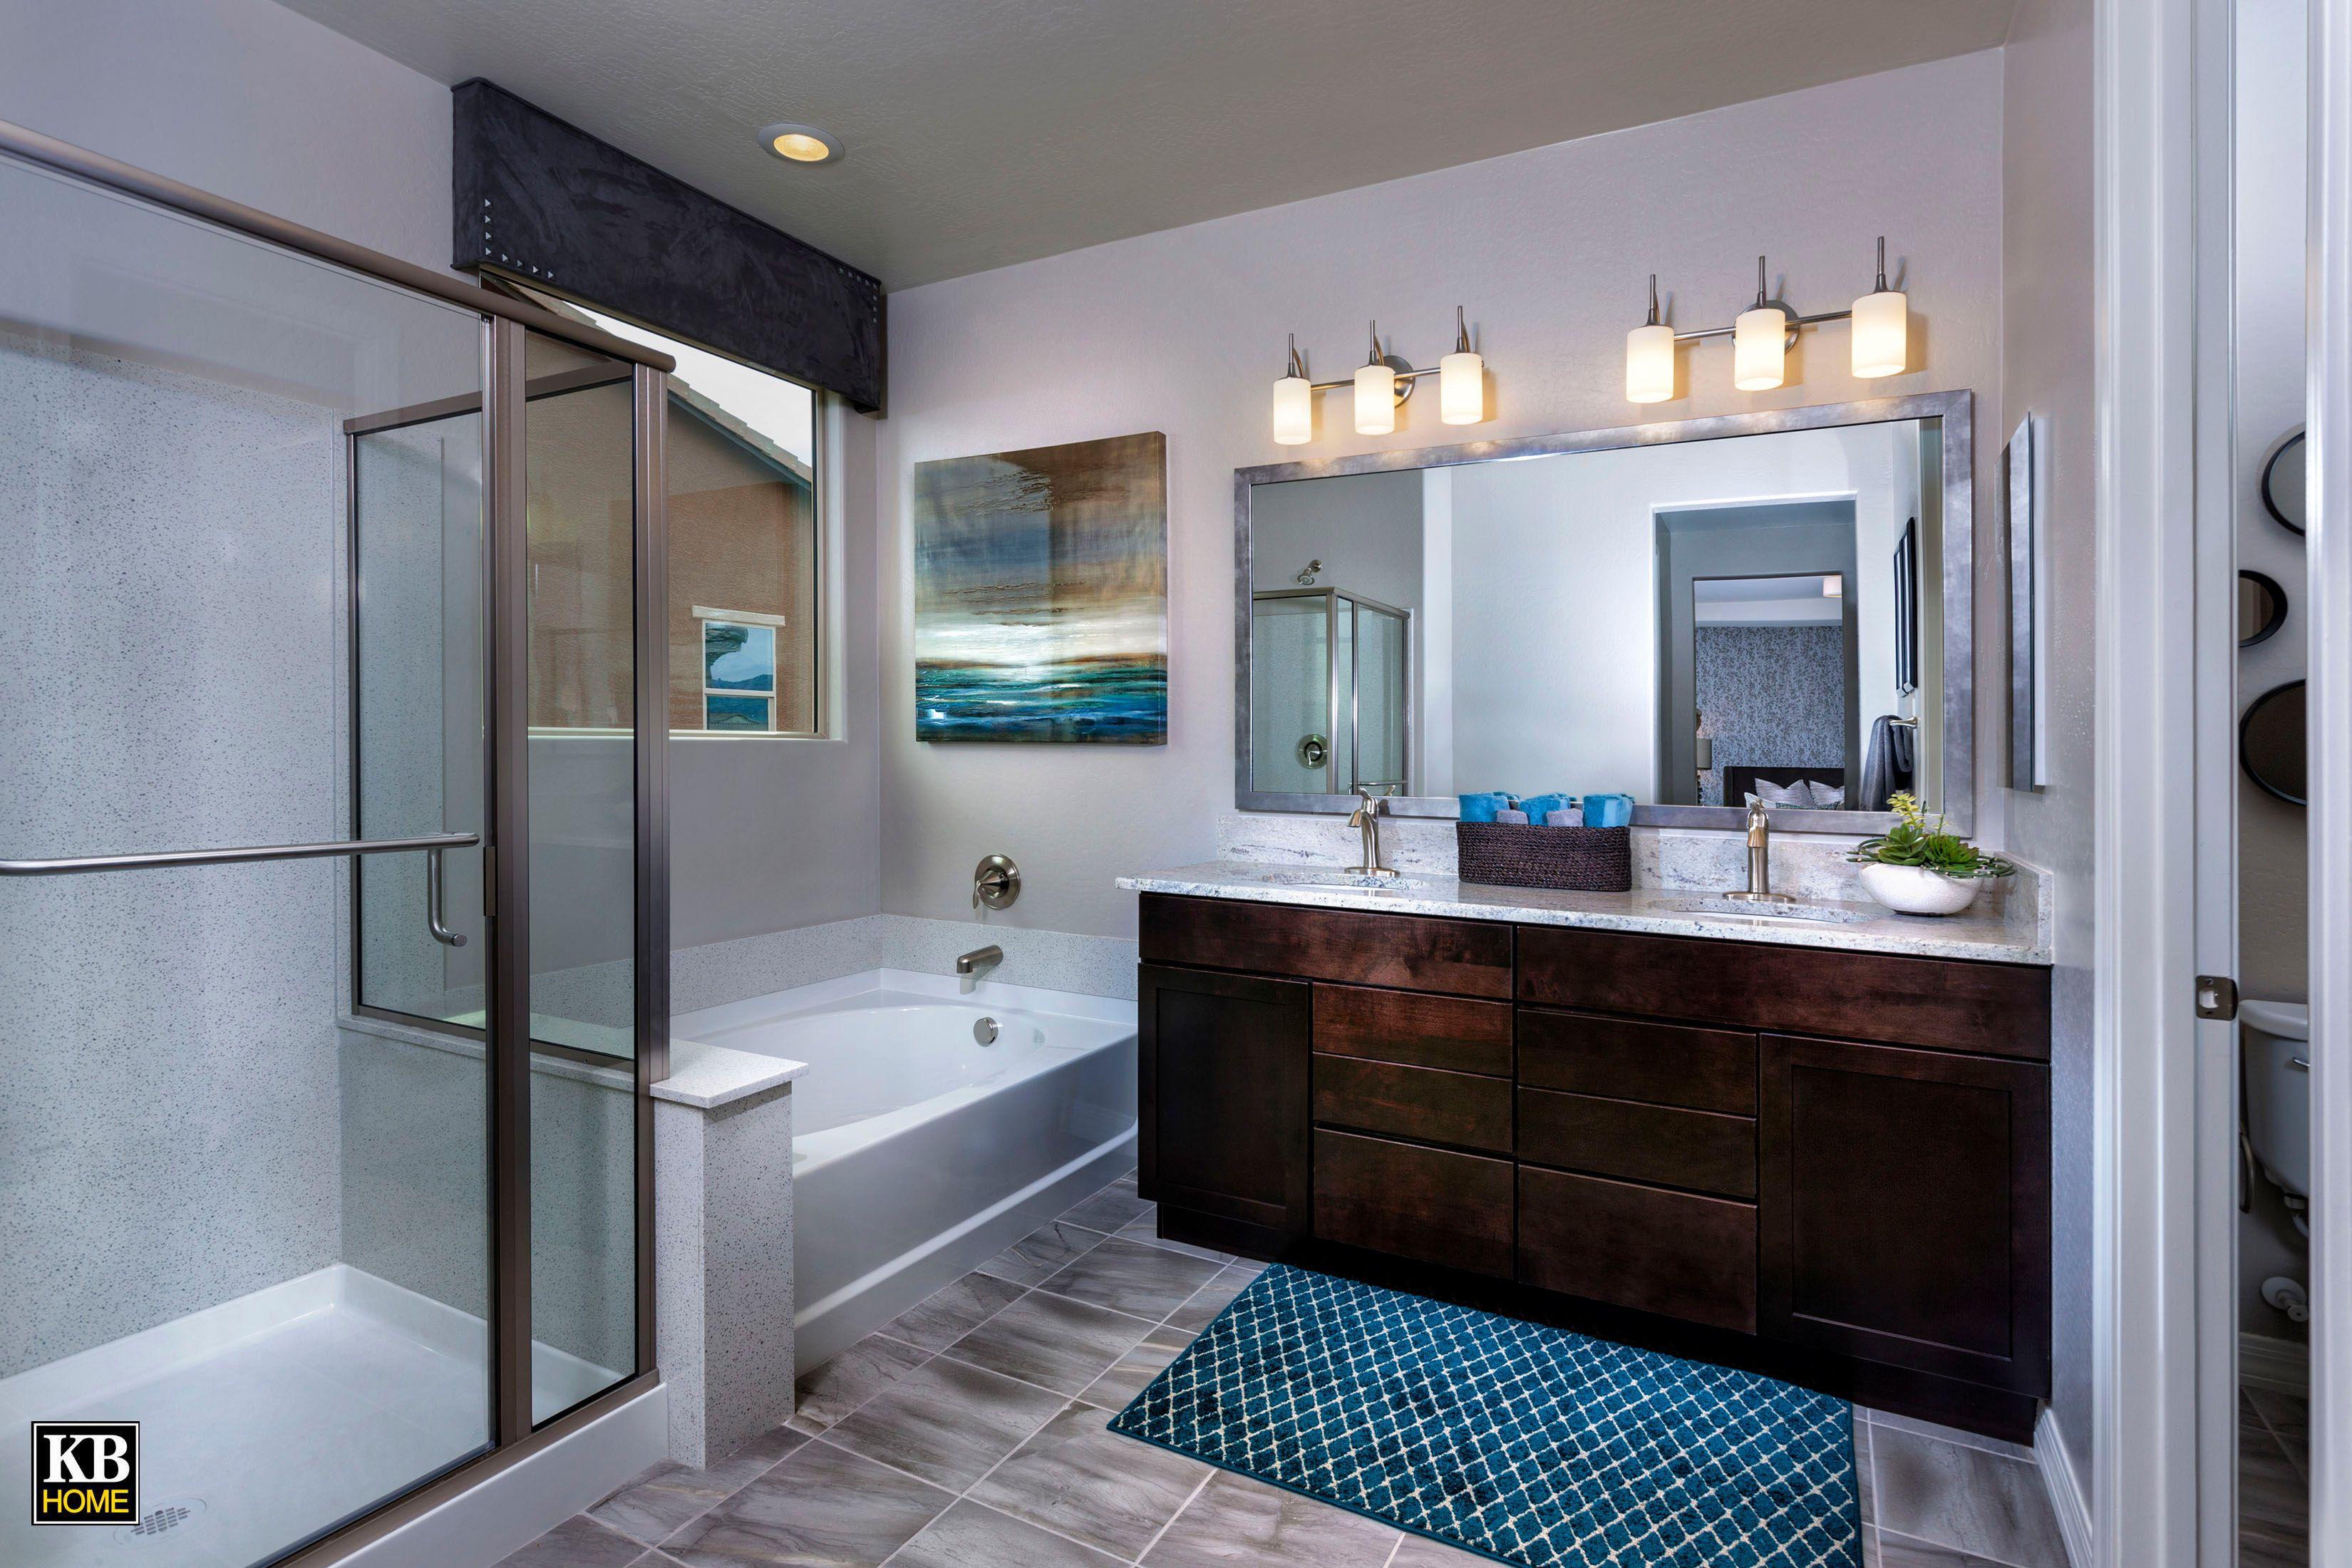 Trailside Point Model Master Bathroom Plan 1874 Kbhome Arizona Interiordesign Currentdesignsituation Modernd Bathroom Model Kb Homes New Homes For Sale